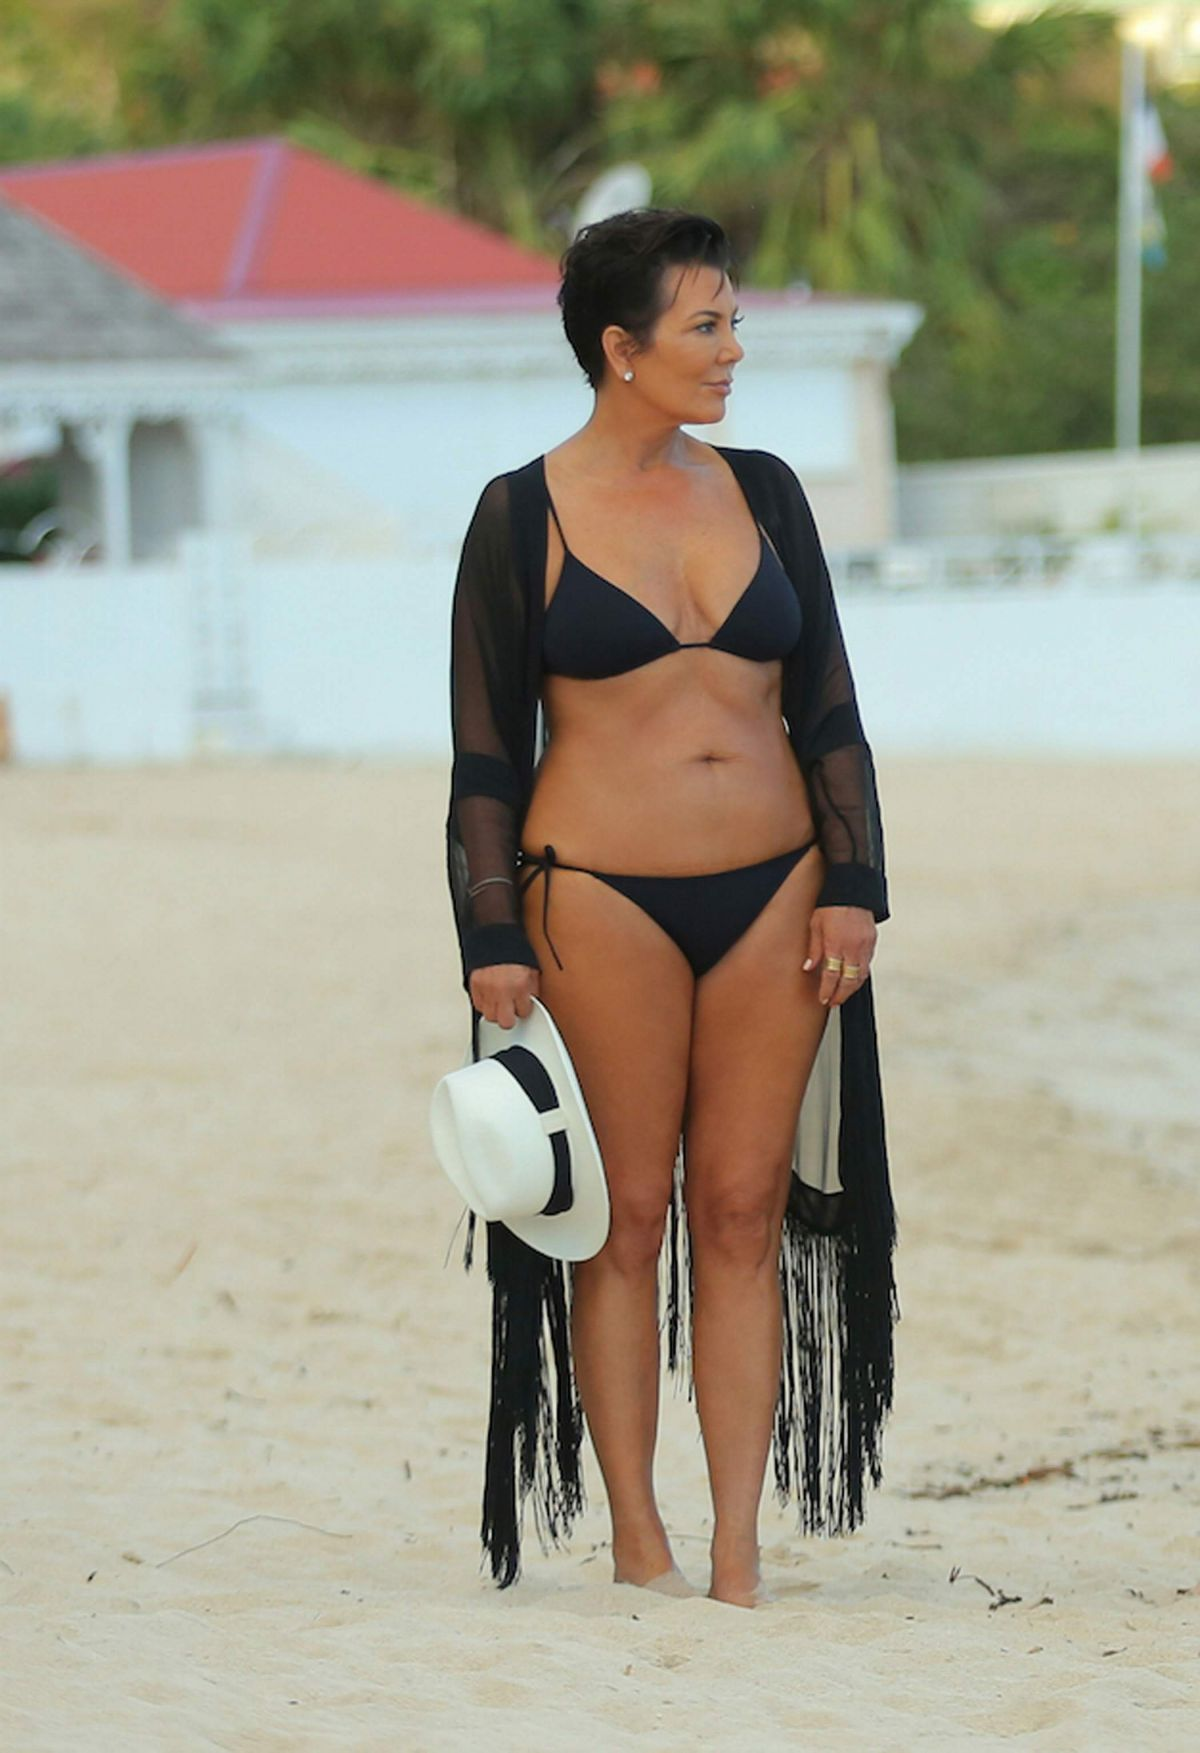 Kris kardashian bikini photos